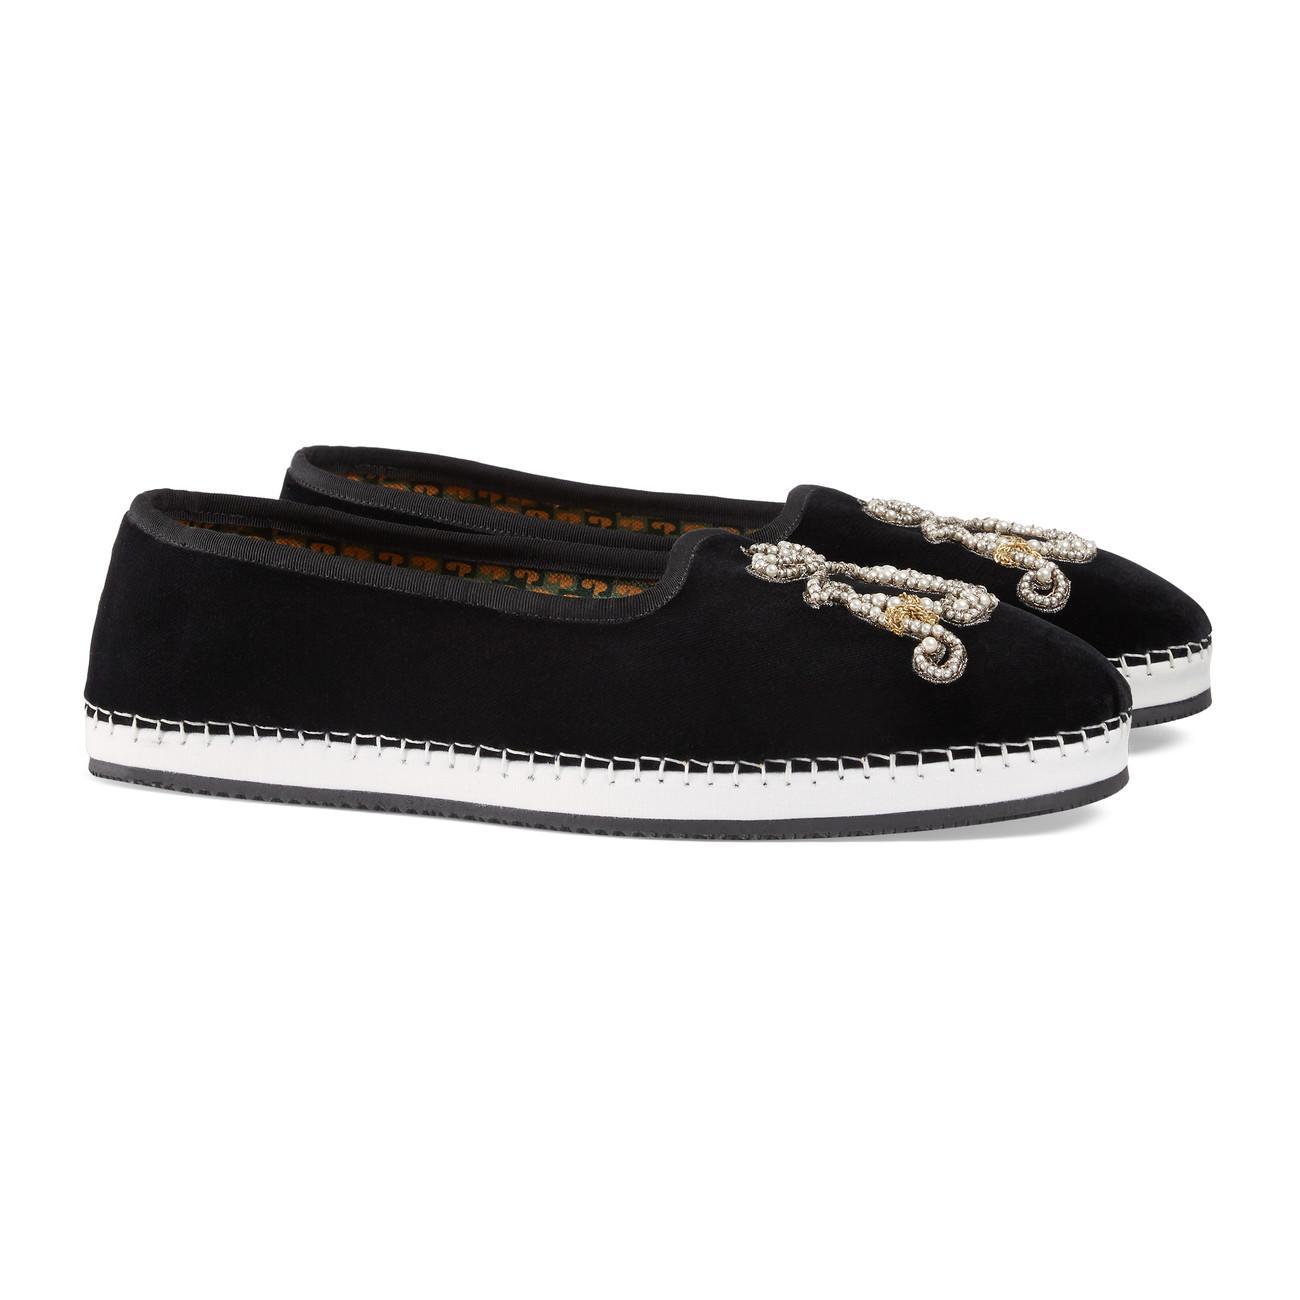 5489066c8 Gucci - Black Men's Velvet Loafer With Am Appliqué for Men - Lyst. View  fullscreen